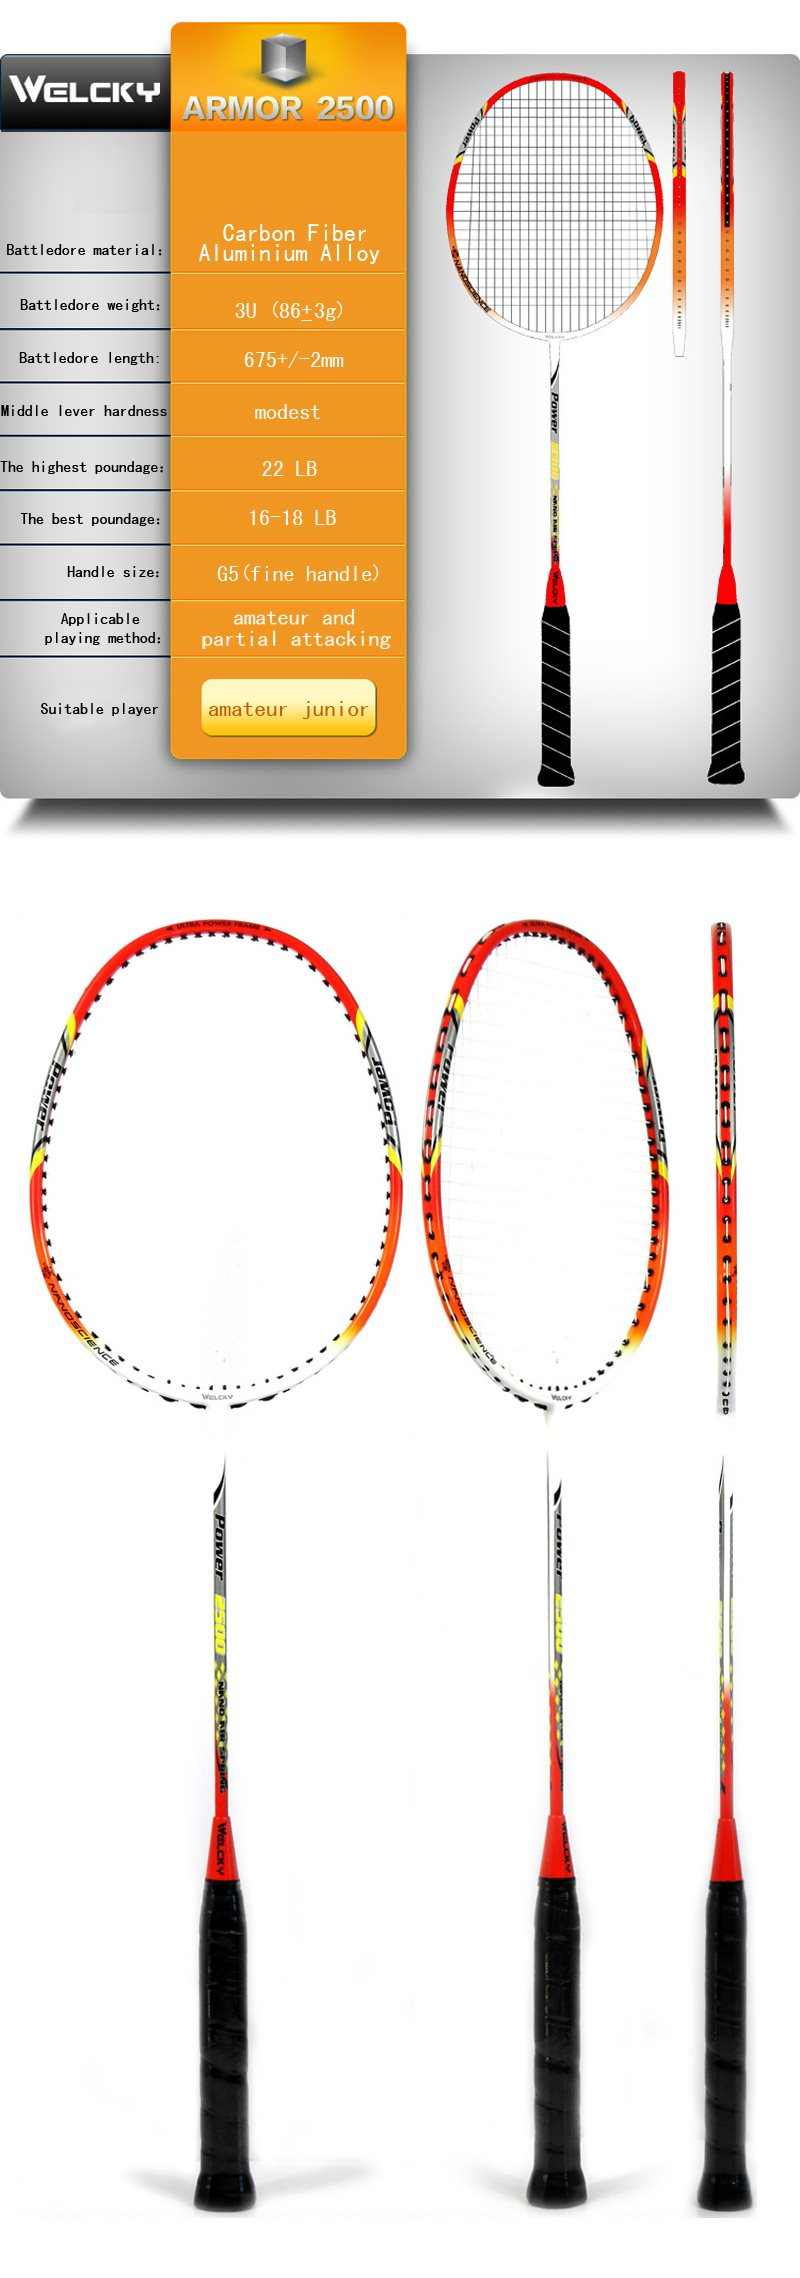 Buy WELCKY Authentic Carbon Fiber 2pcs Badminton Rackets  : 8836ebe4 8e96 4556 8f6b 5a876cb65f62 from www.bydeals.net size 800 x 2278 jpeg 174kB